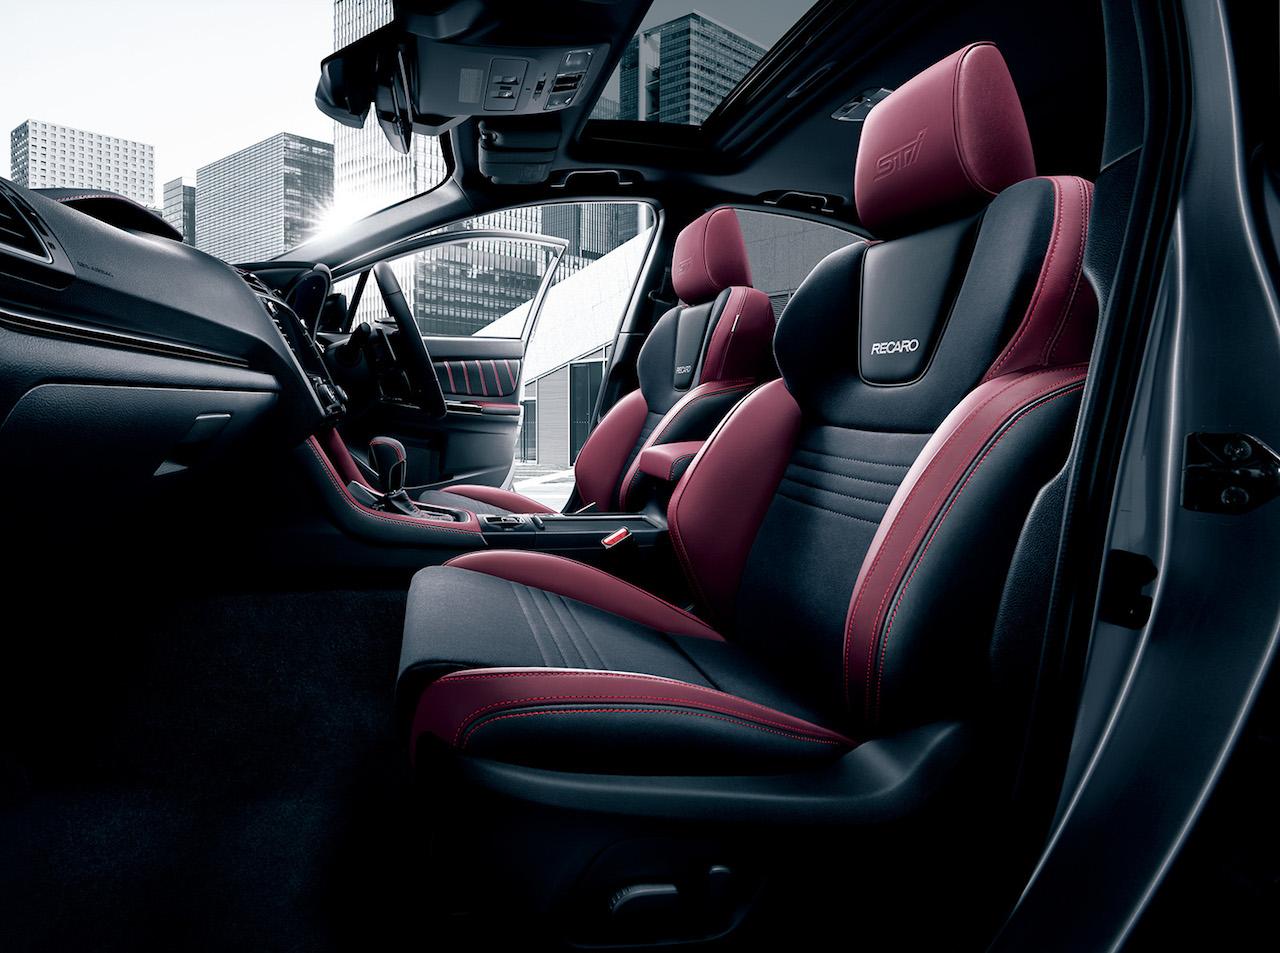 「SUBARU WRX S4が一部改良。走りと装備を強化した特別仕様車「WRX S4 STI Sport♯」を500台限定で設定【新車】」の9枚目の画像